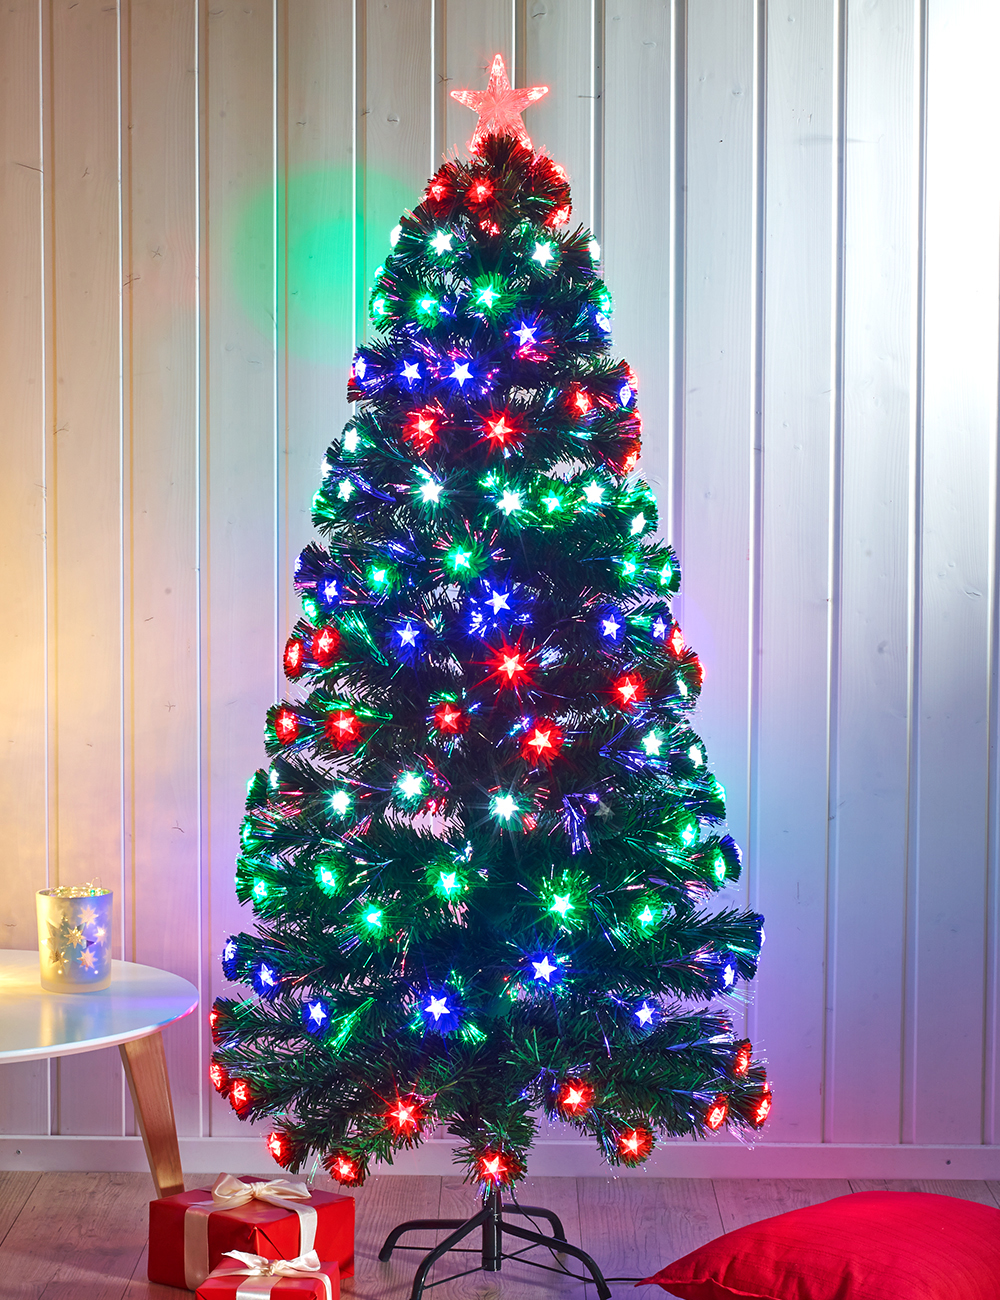 Tannenbaum Led.Tannenbaum Mit 170 Bunten Leds Und Fiberoptik